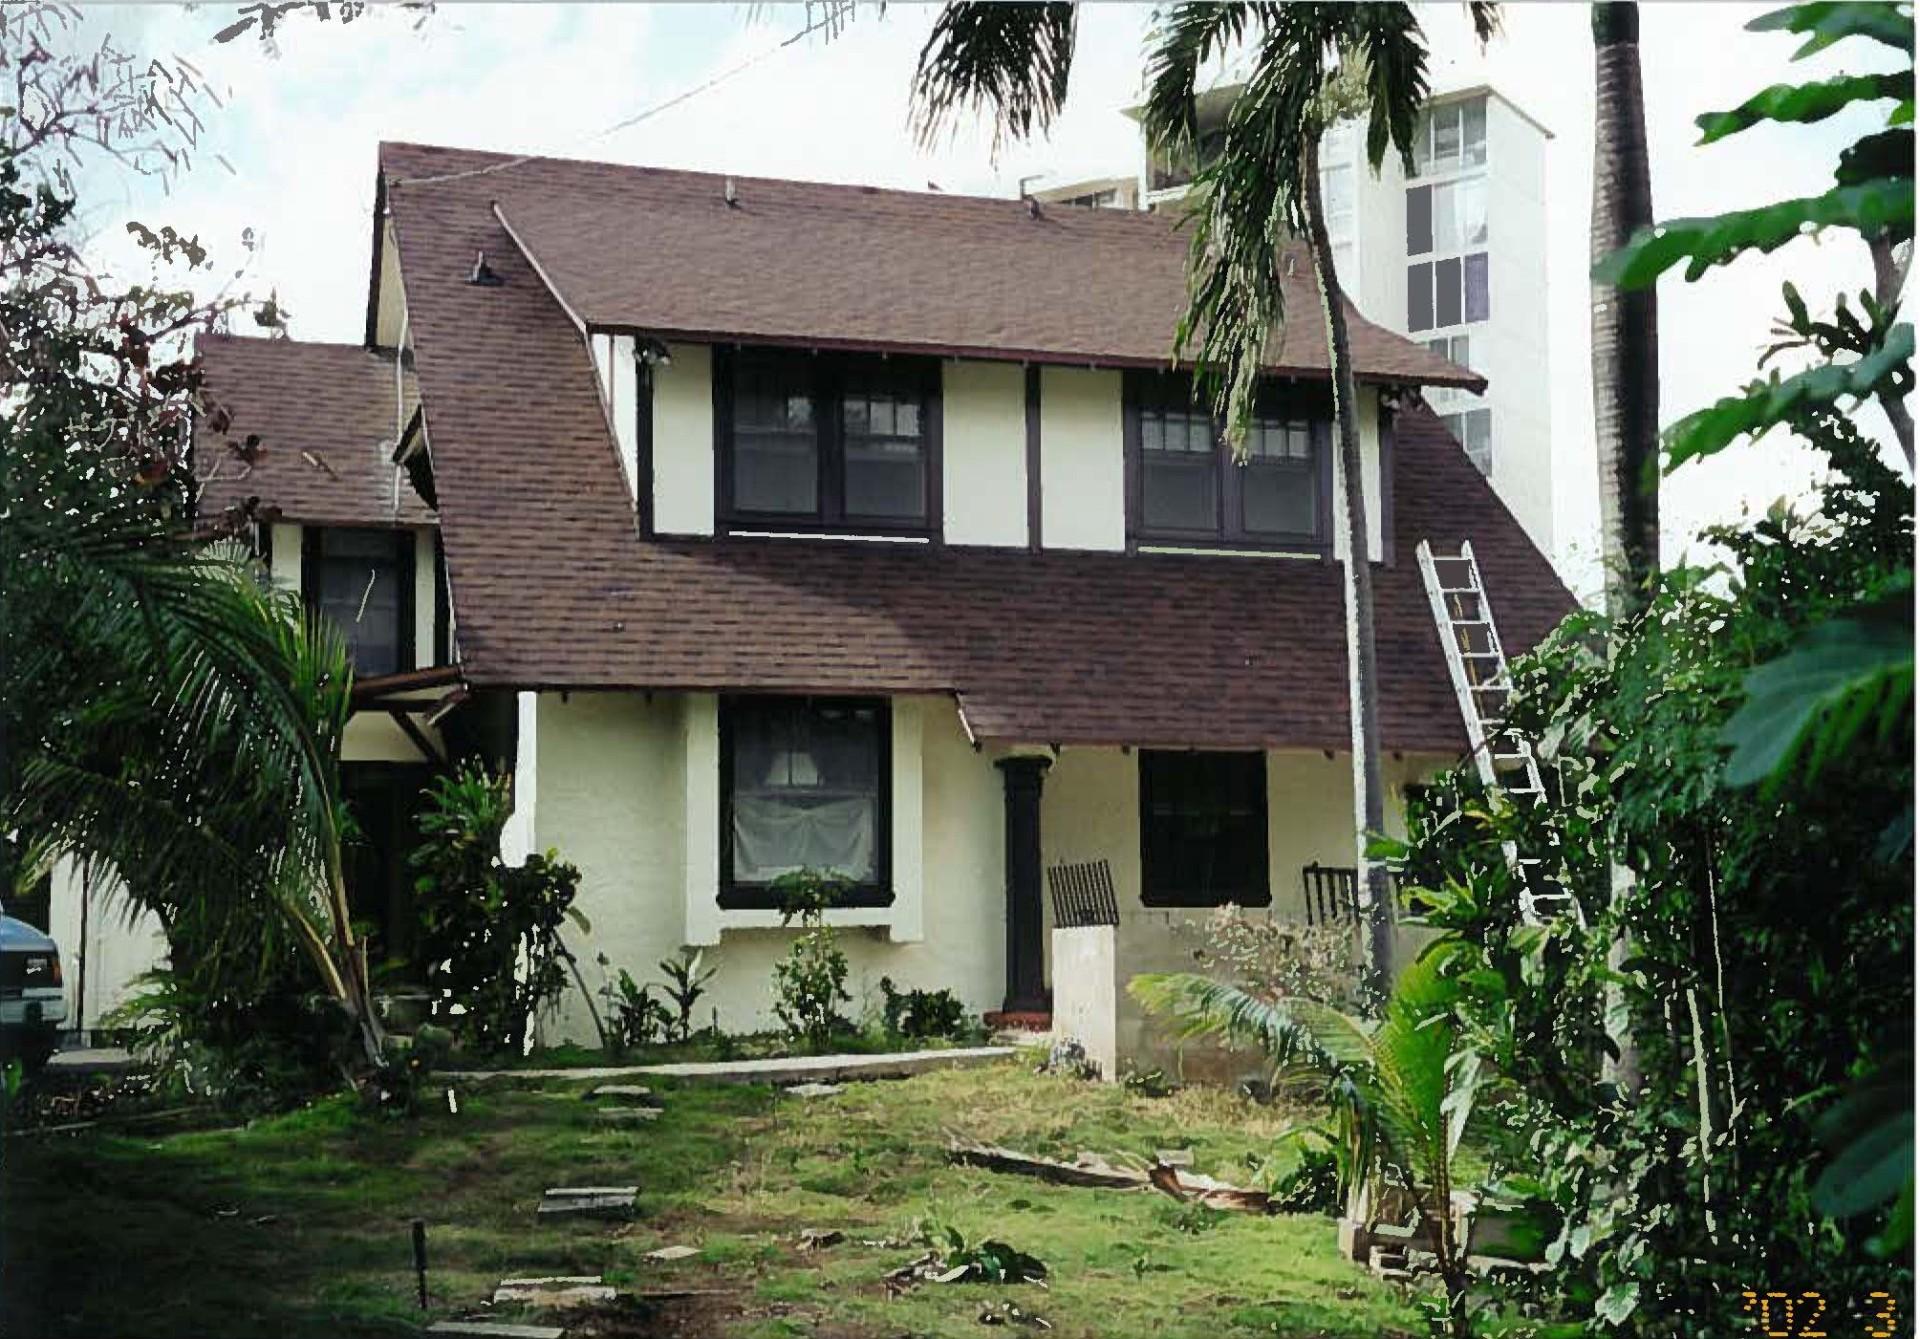 1614 Anapuni Street/1619 Makiki Street/ Mildred M. Yodor House